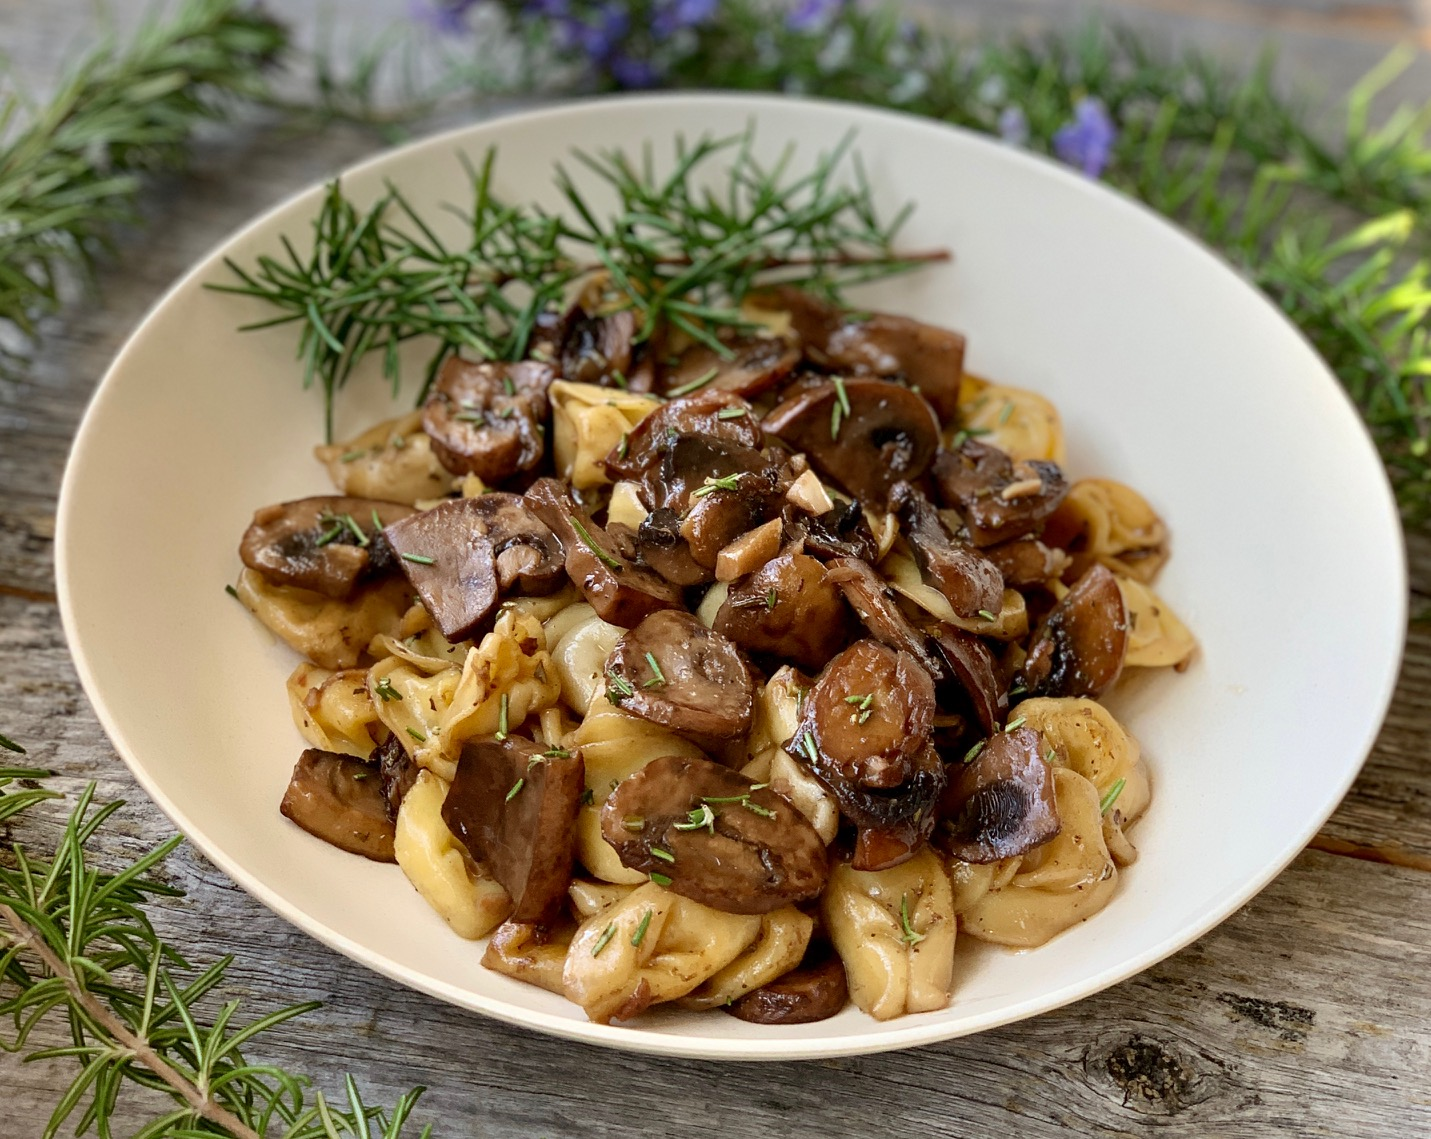 Garlic Herb Mushrooms with Pasta